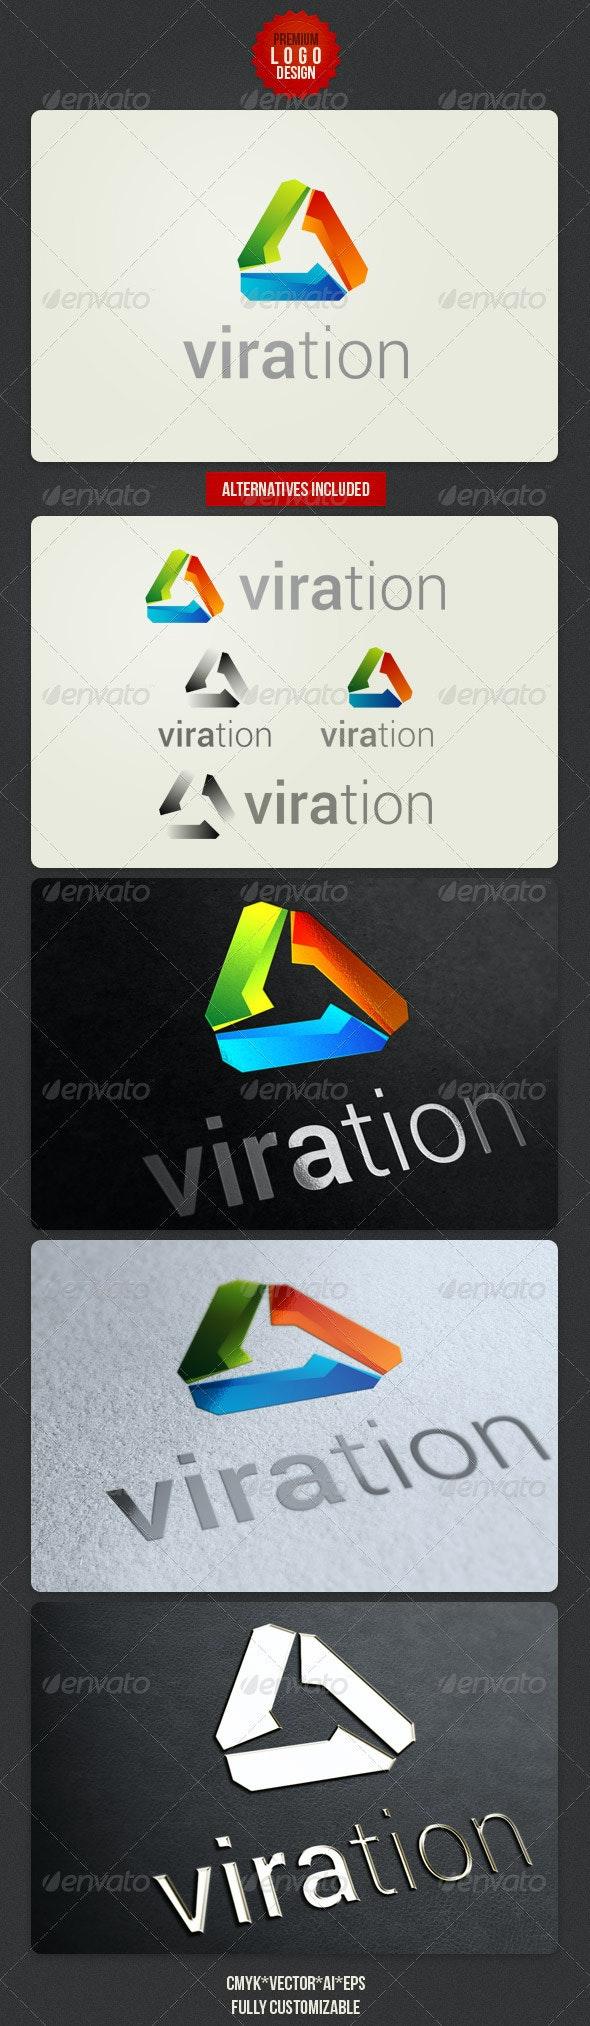 Viration Clean Logo Design - Symbols Logo Templates